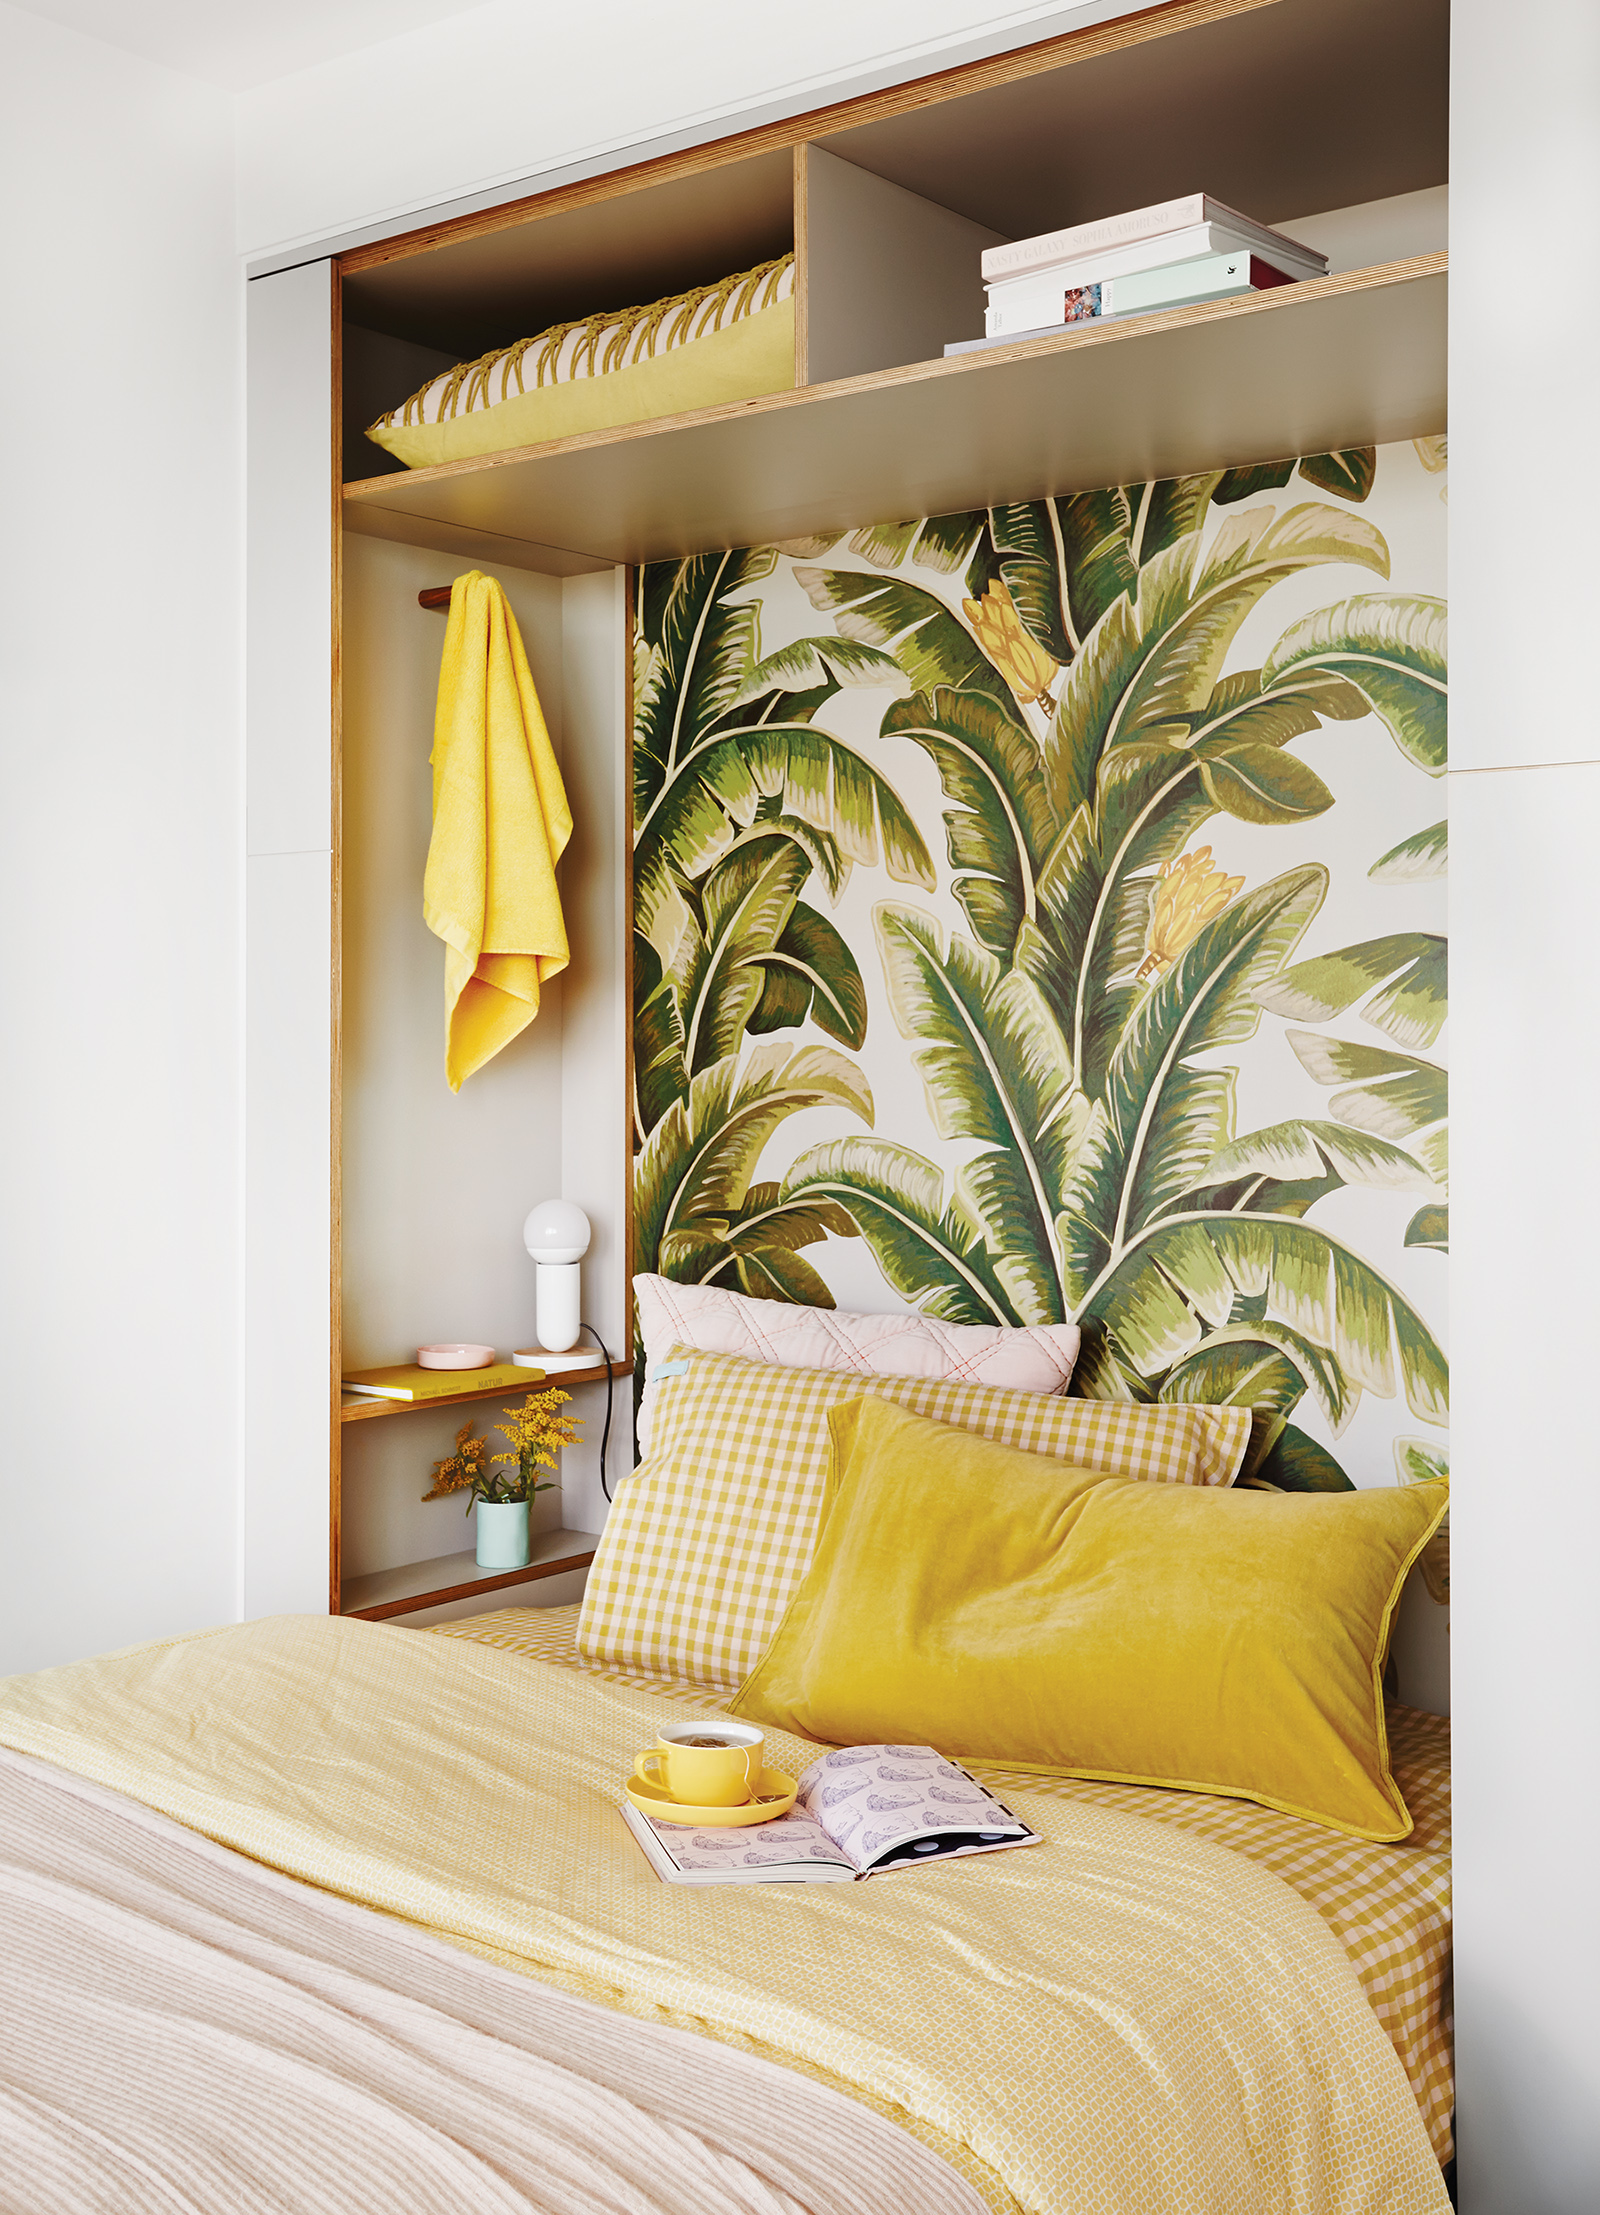 Interior design   Petrina Turner  /  Photography   Annette O'Brien  /  Styling   Julia Green